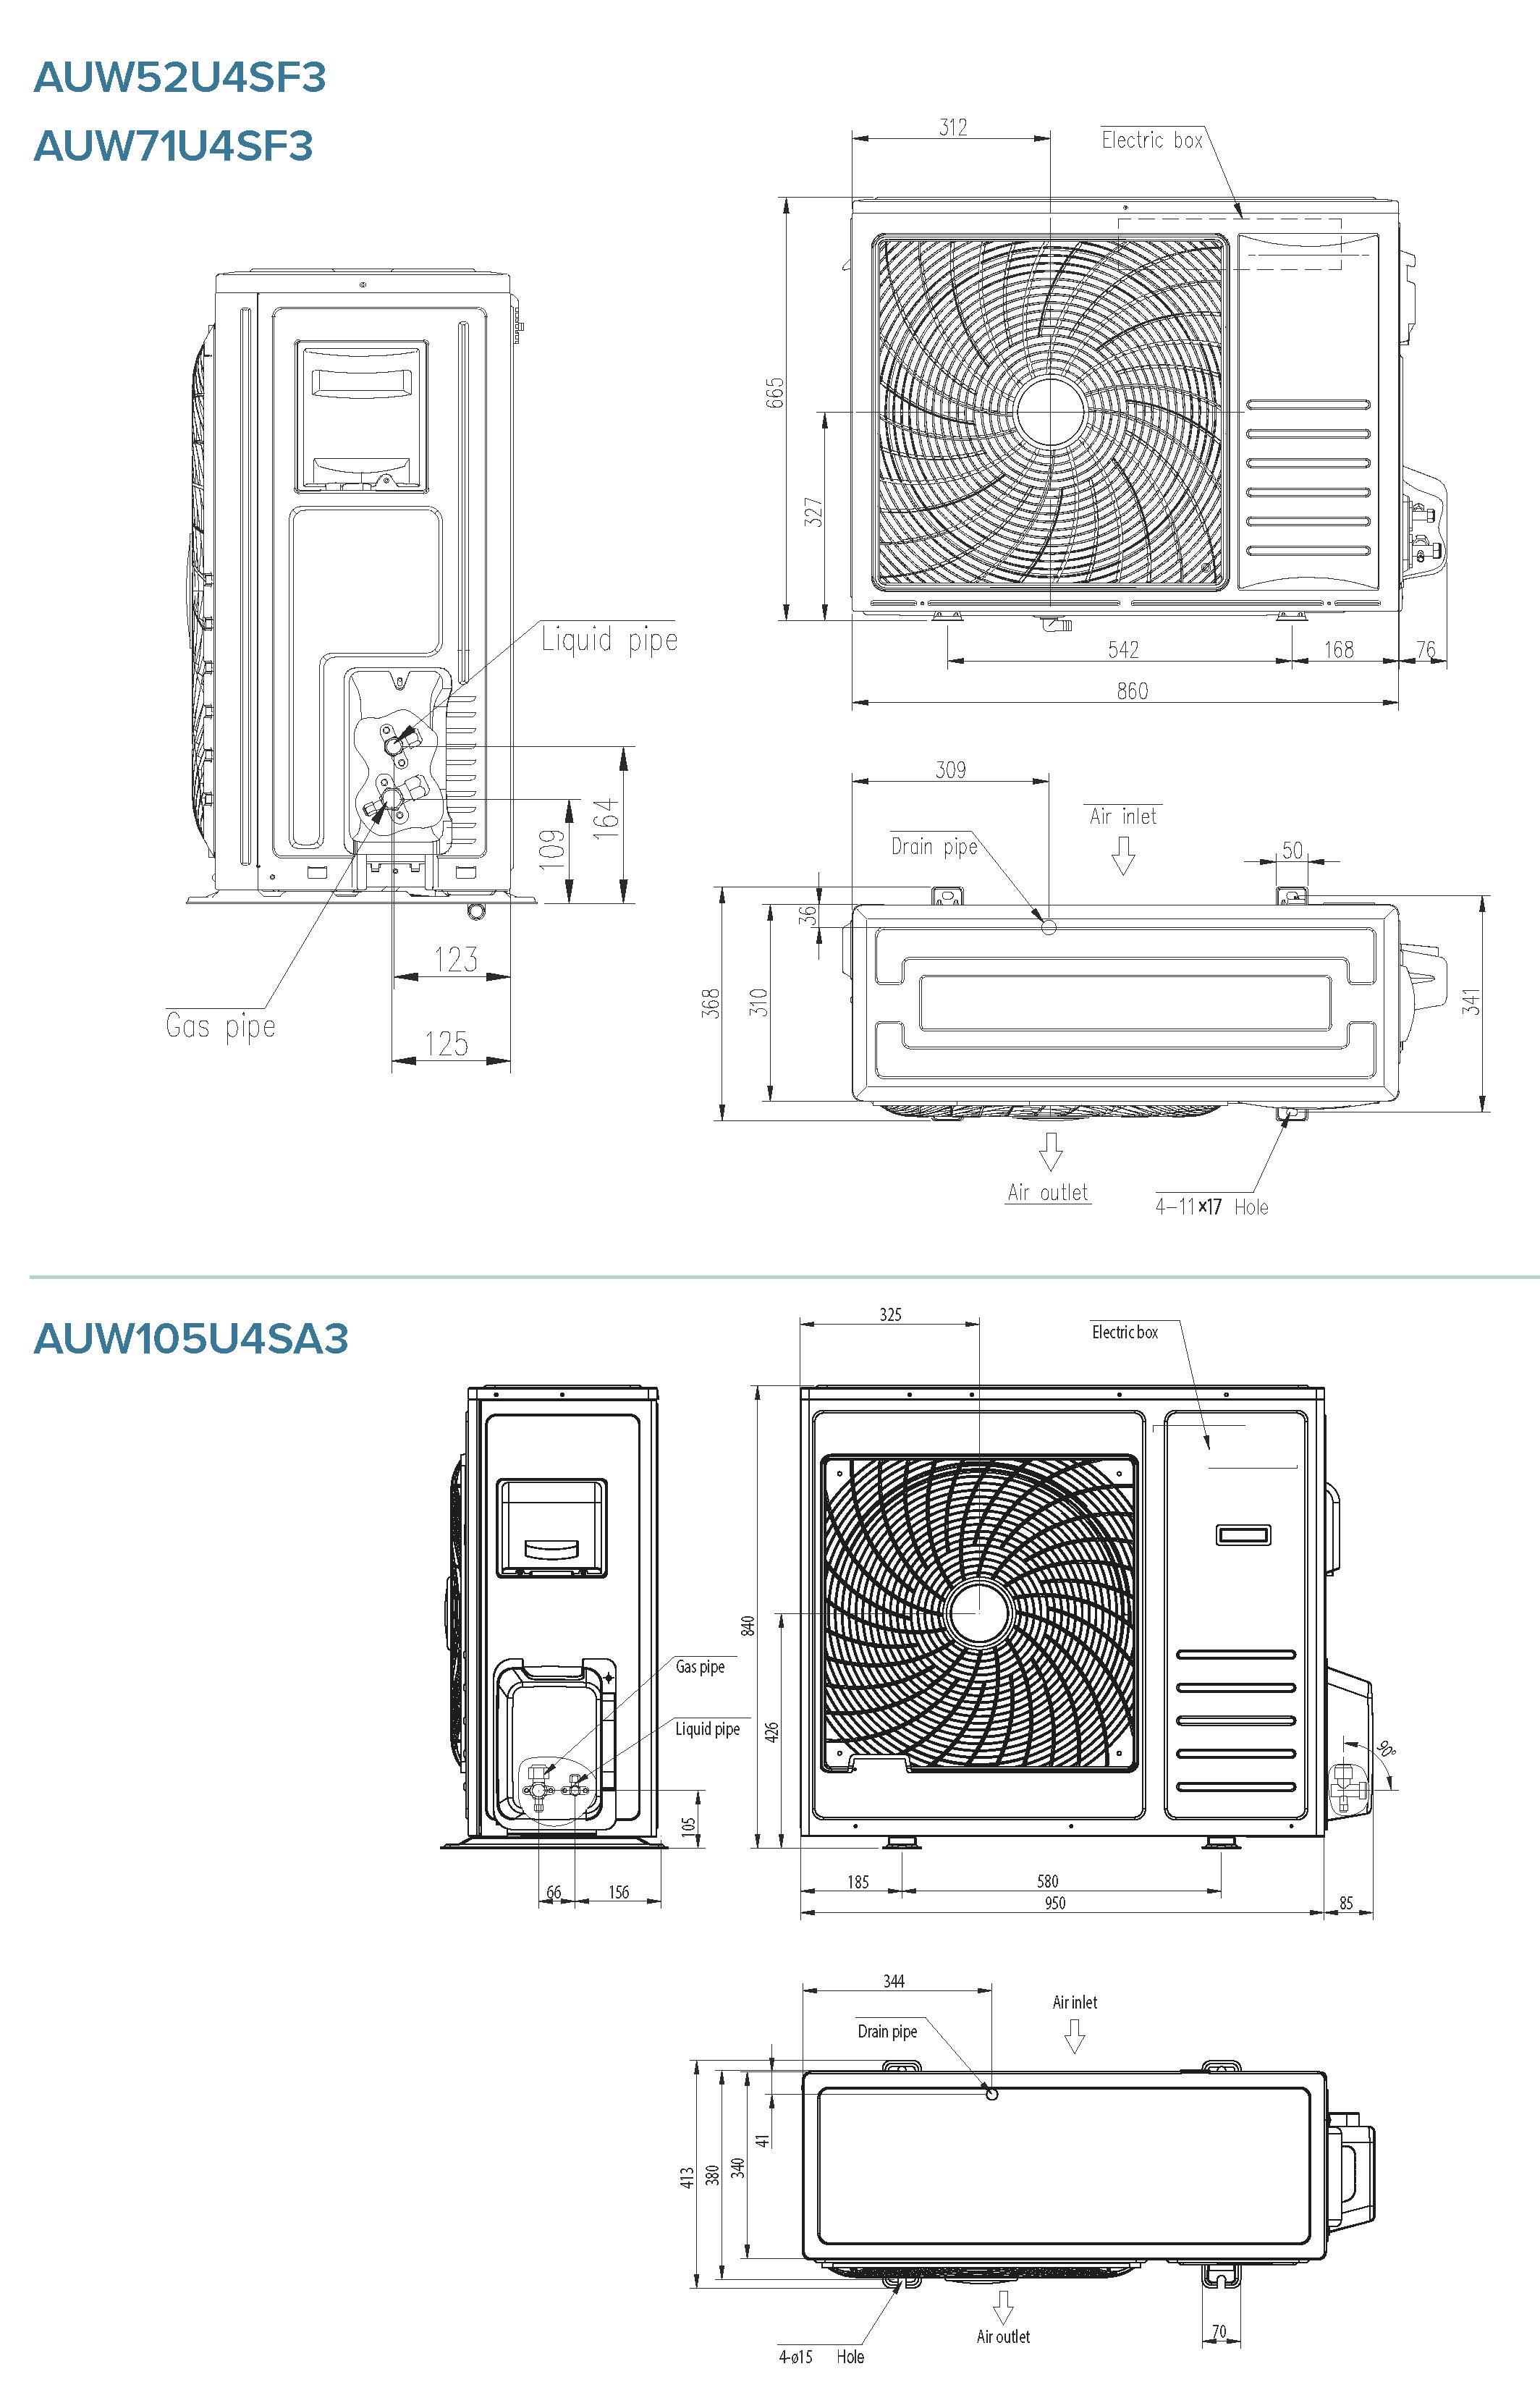 Condizionatore Hisense Commerciale 36000 Btu AUC105UR4SGB3 A++/A+